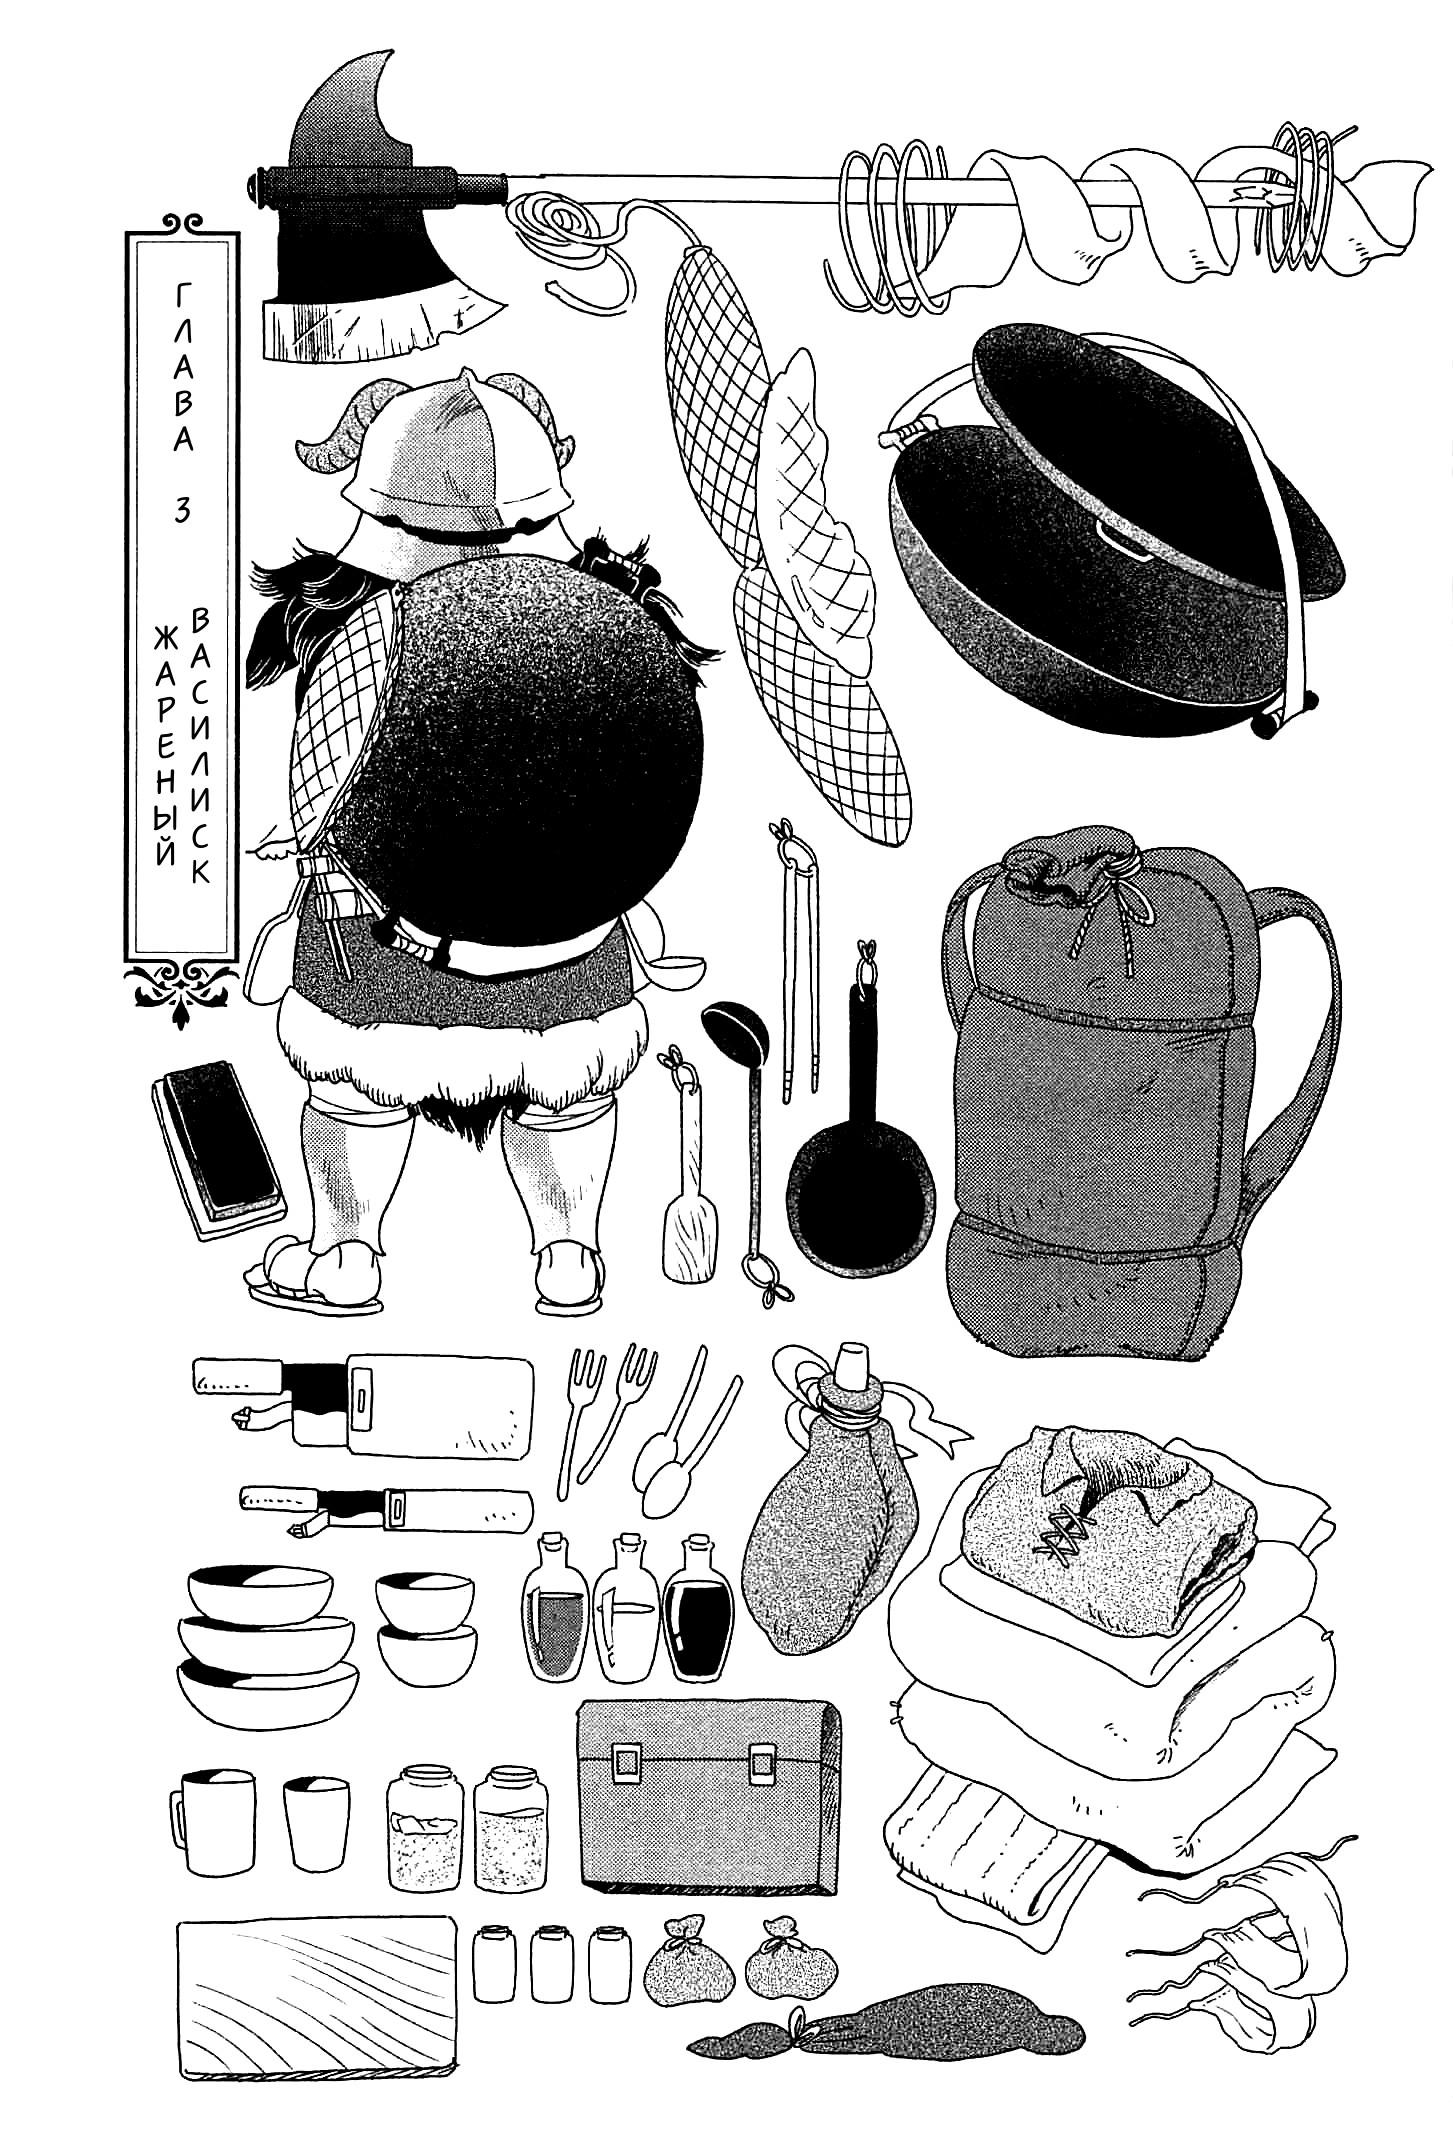 https://r1.ninemanga.com/comics/pic2/50/27634/279199/1448709079260.jpg Page 1